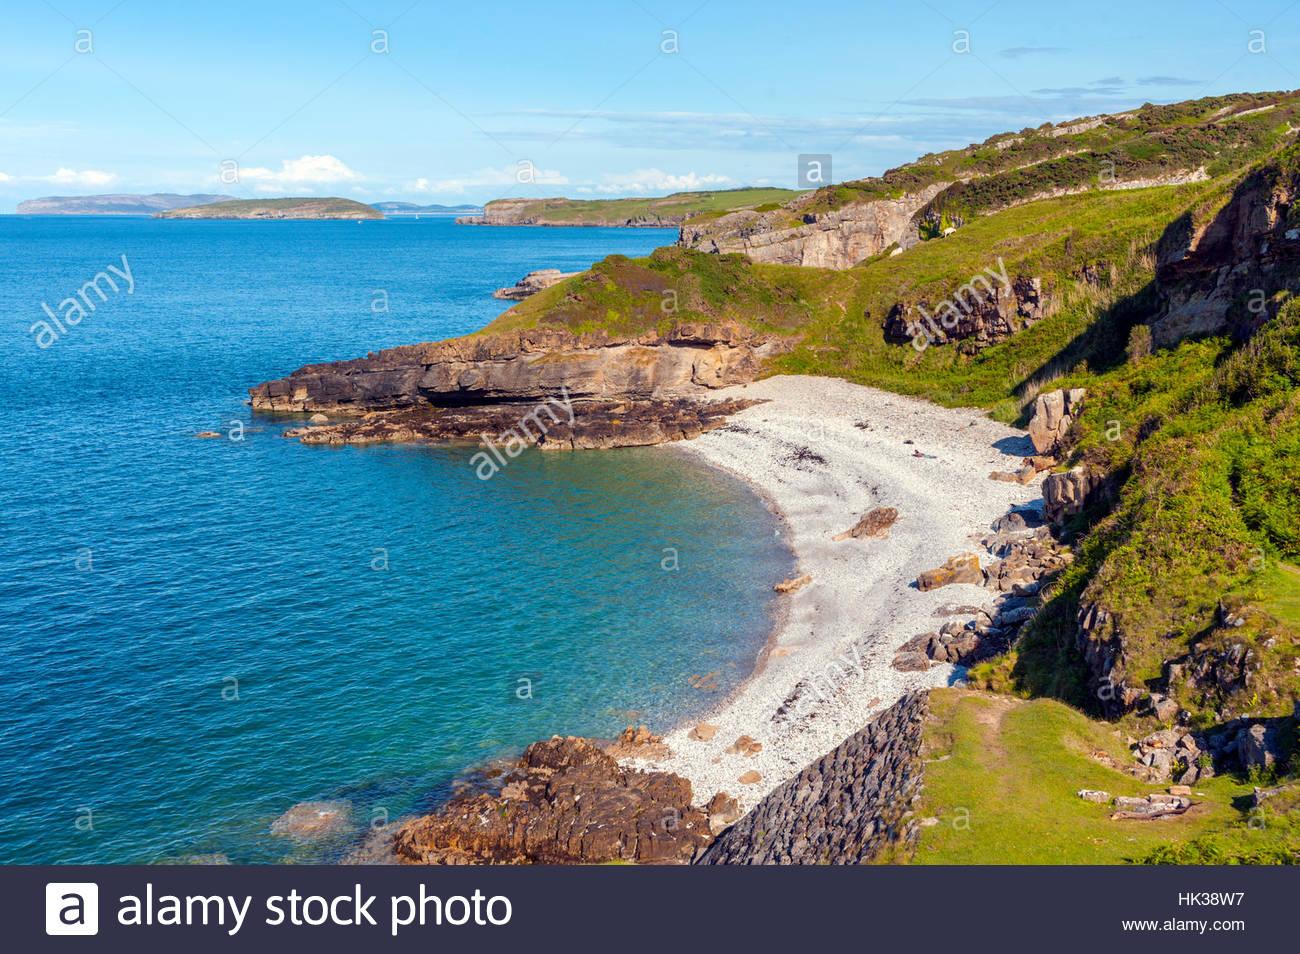 The beach and coastline near Seriol Anglesey Stock Photo